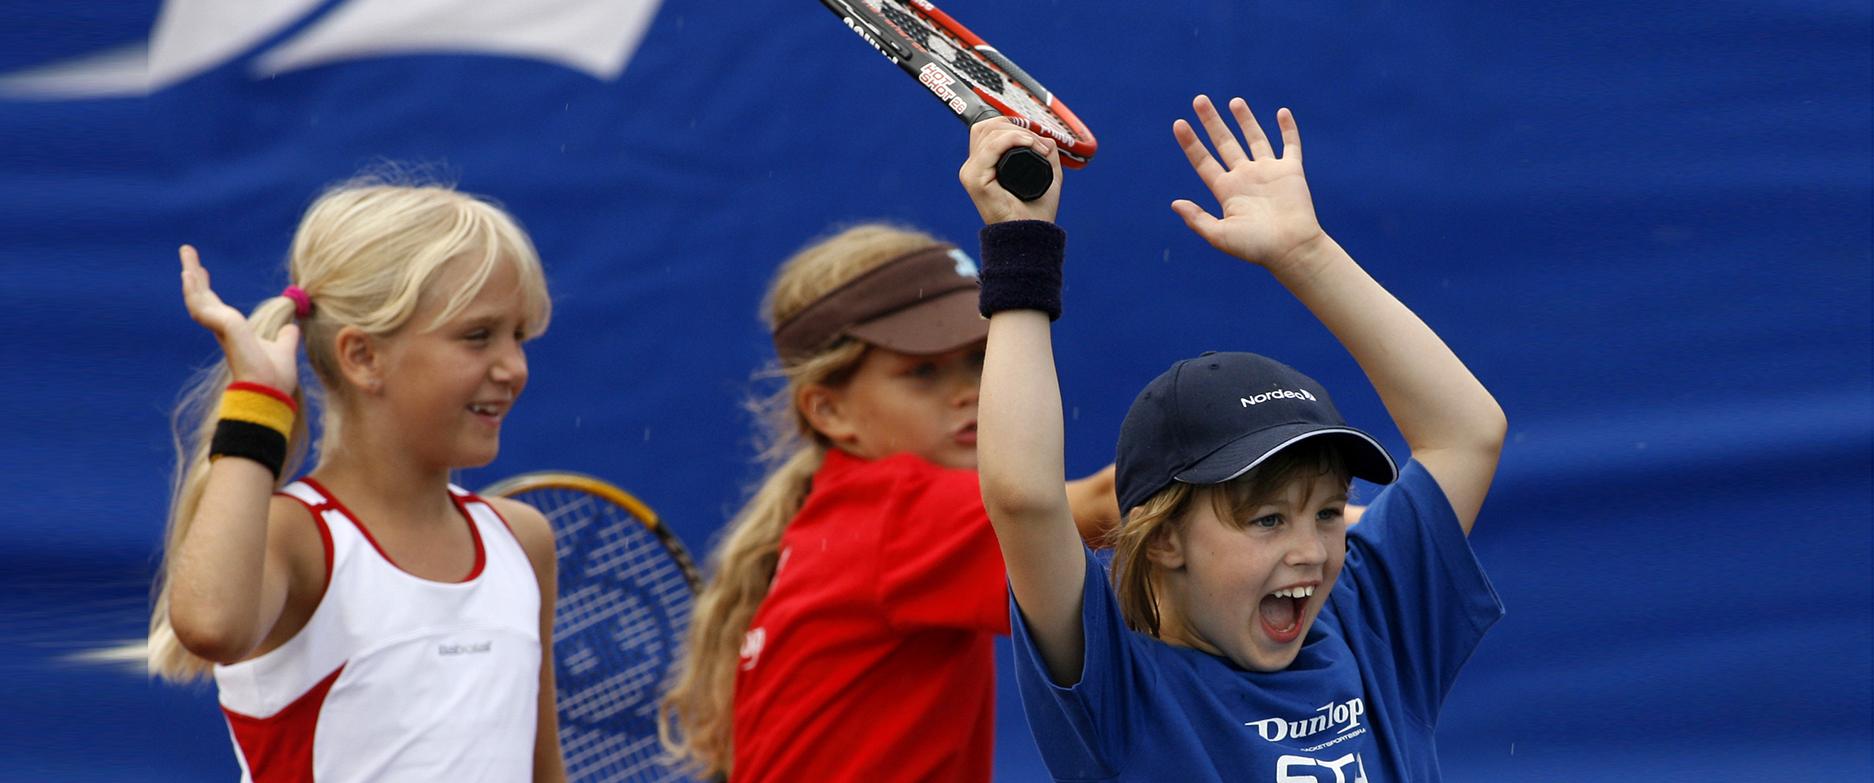 Tennis läger Stockholm Tennis Academy